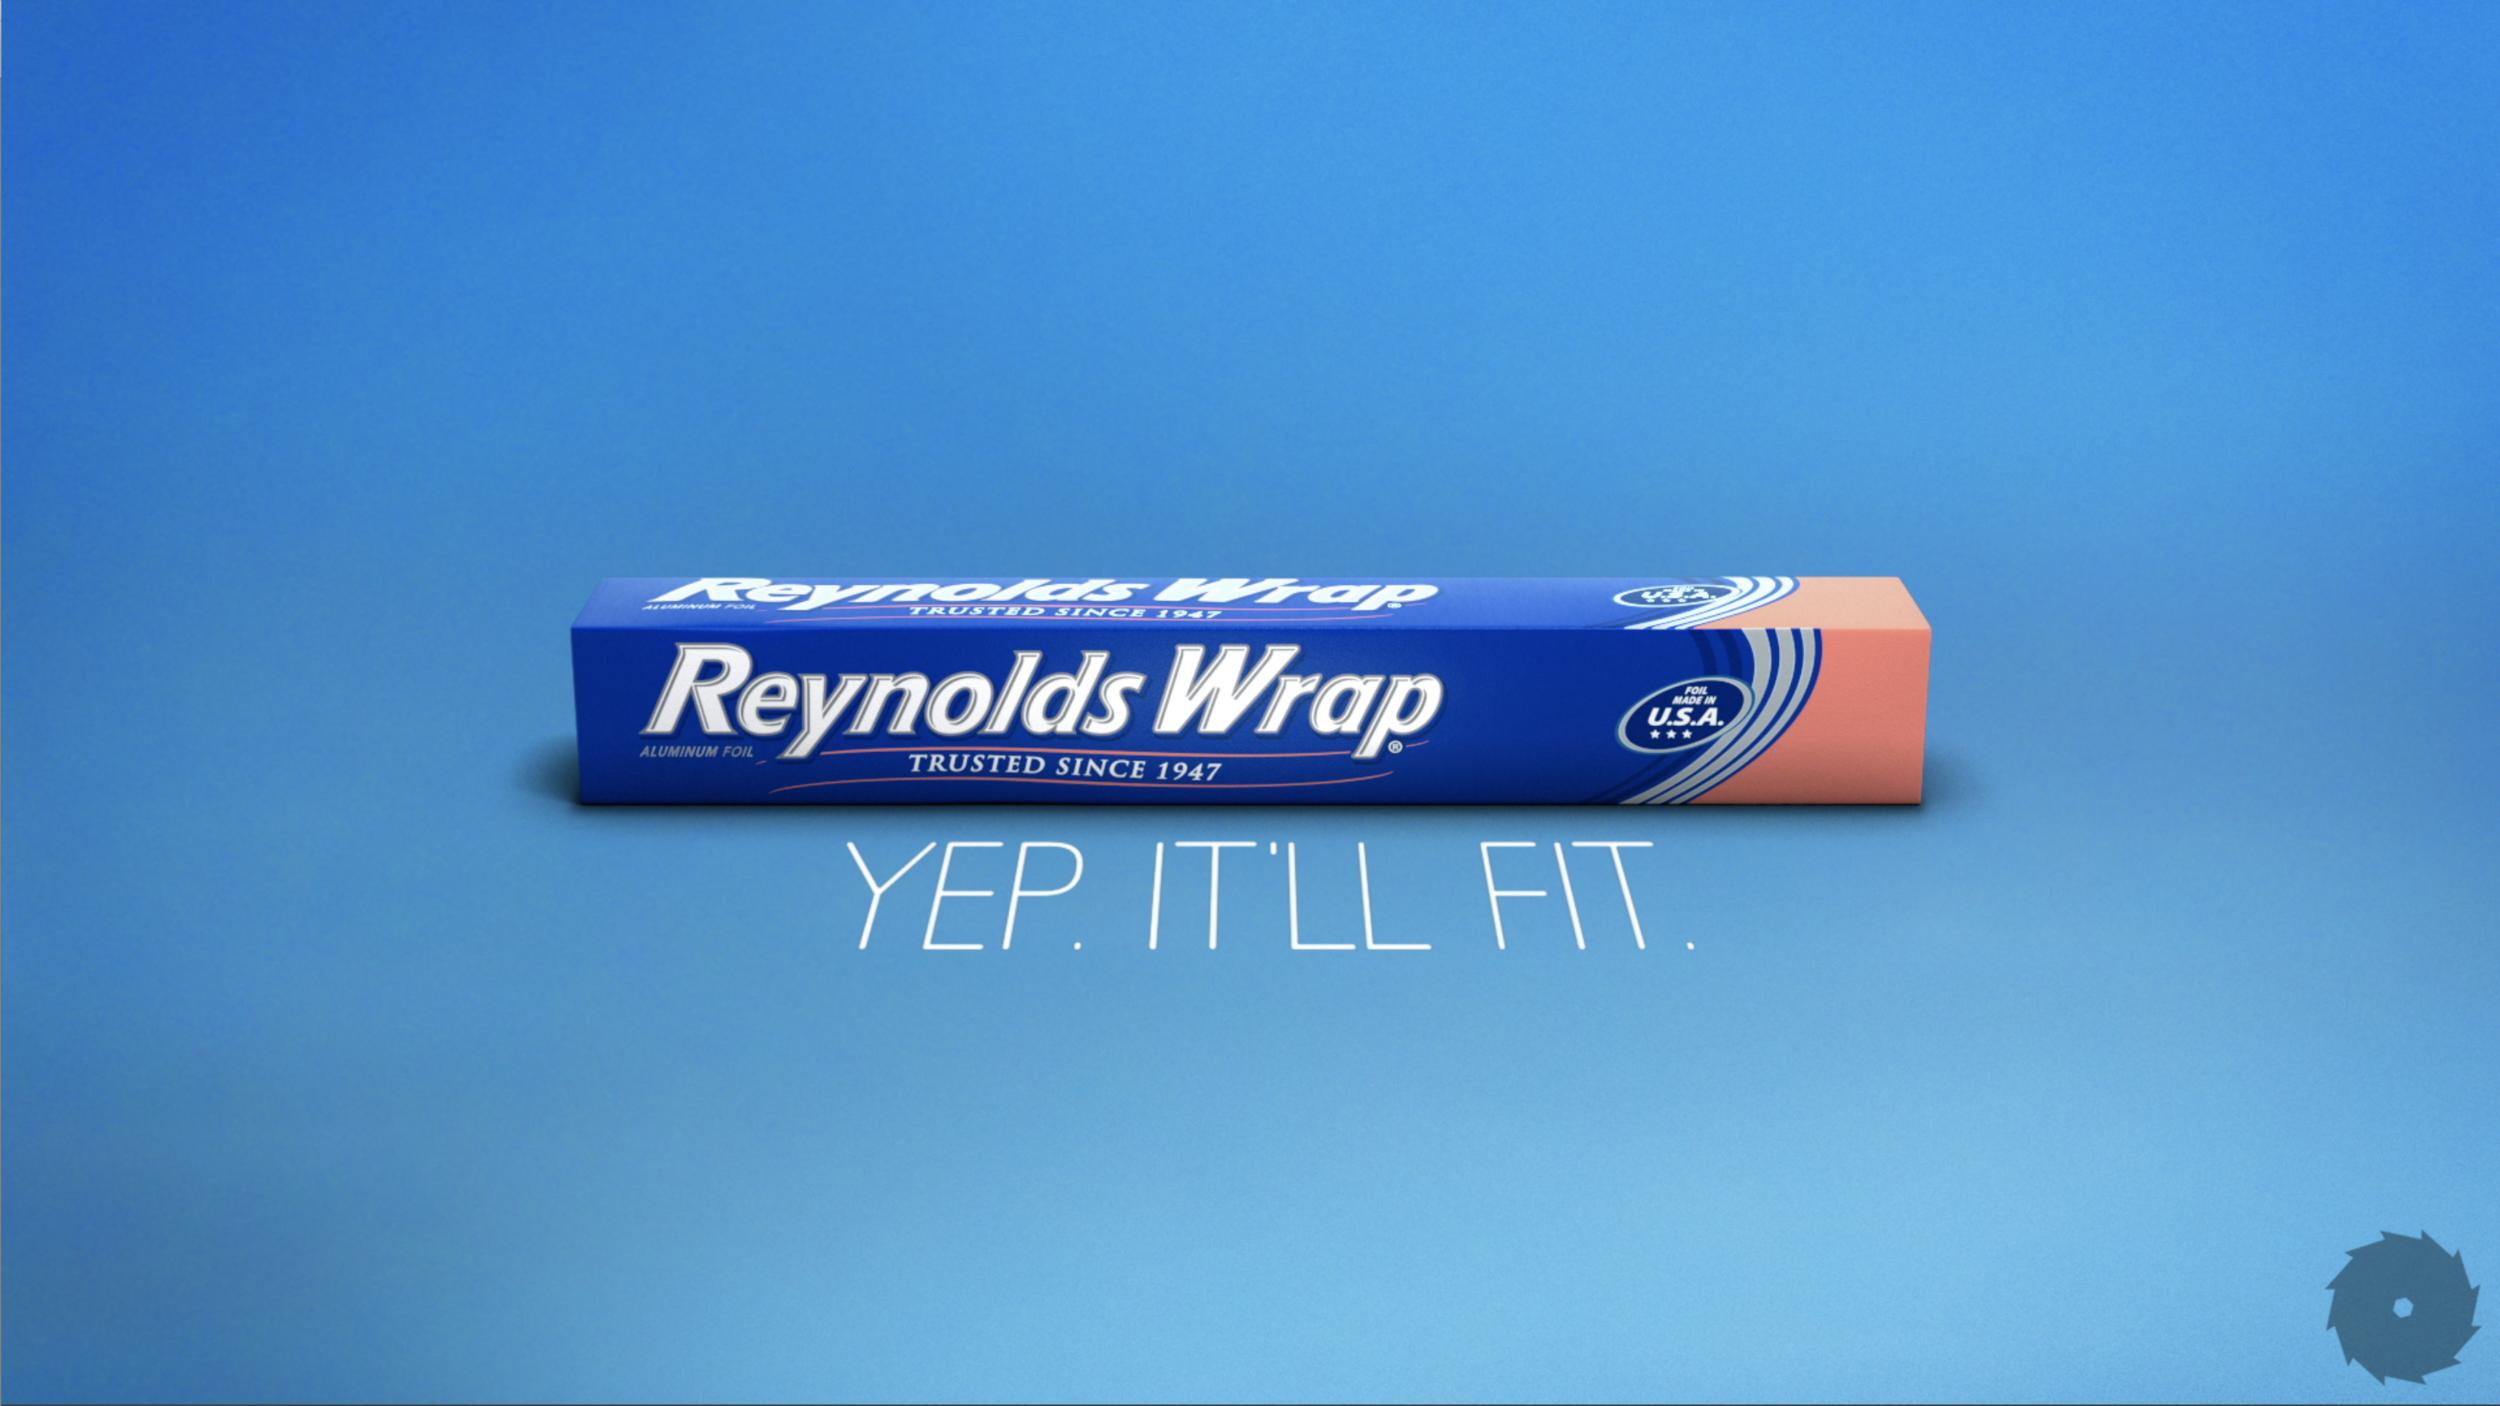 Reynolds Wrap - Yep It'll Fit